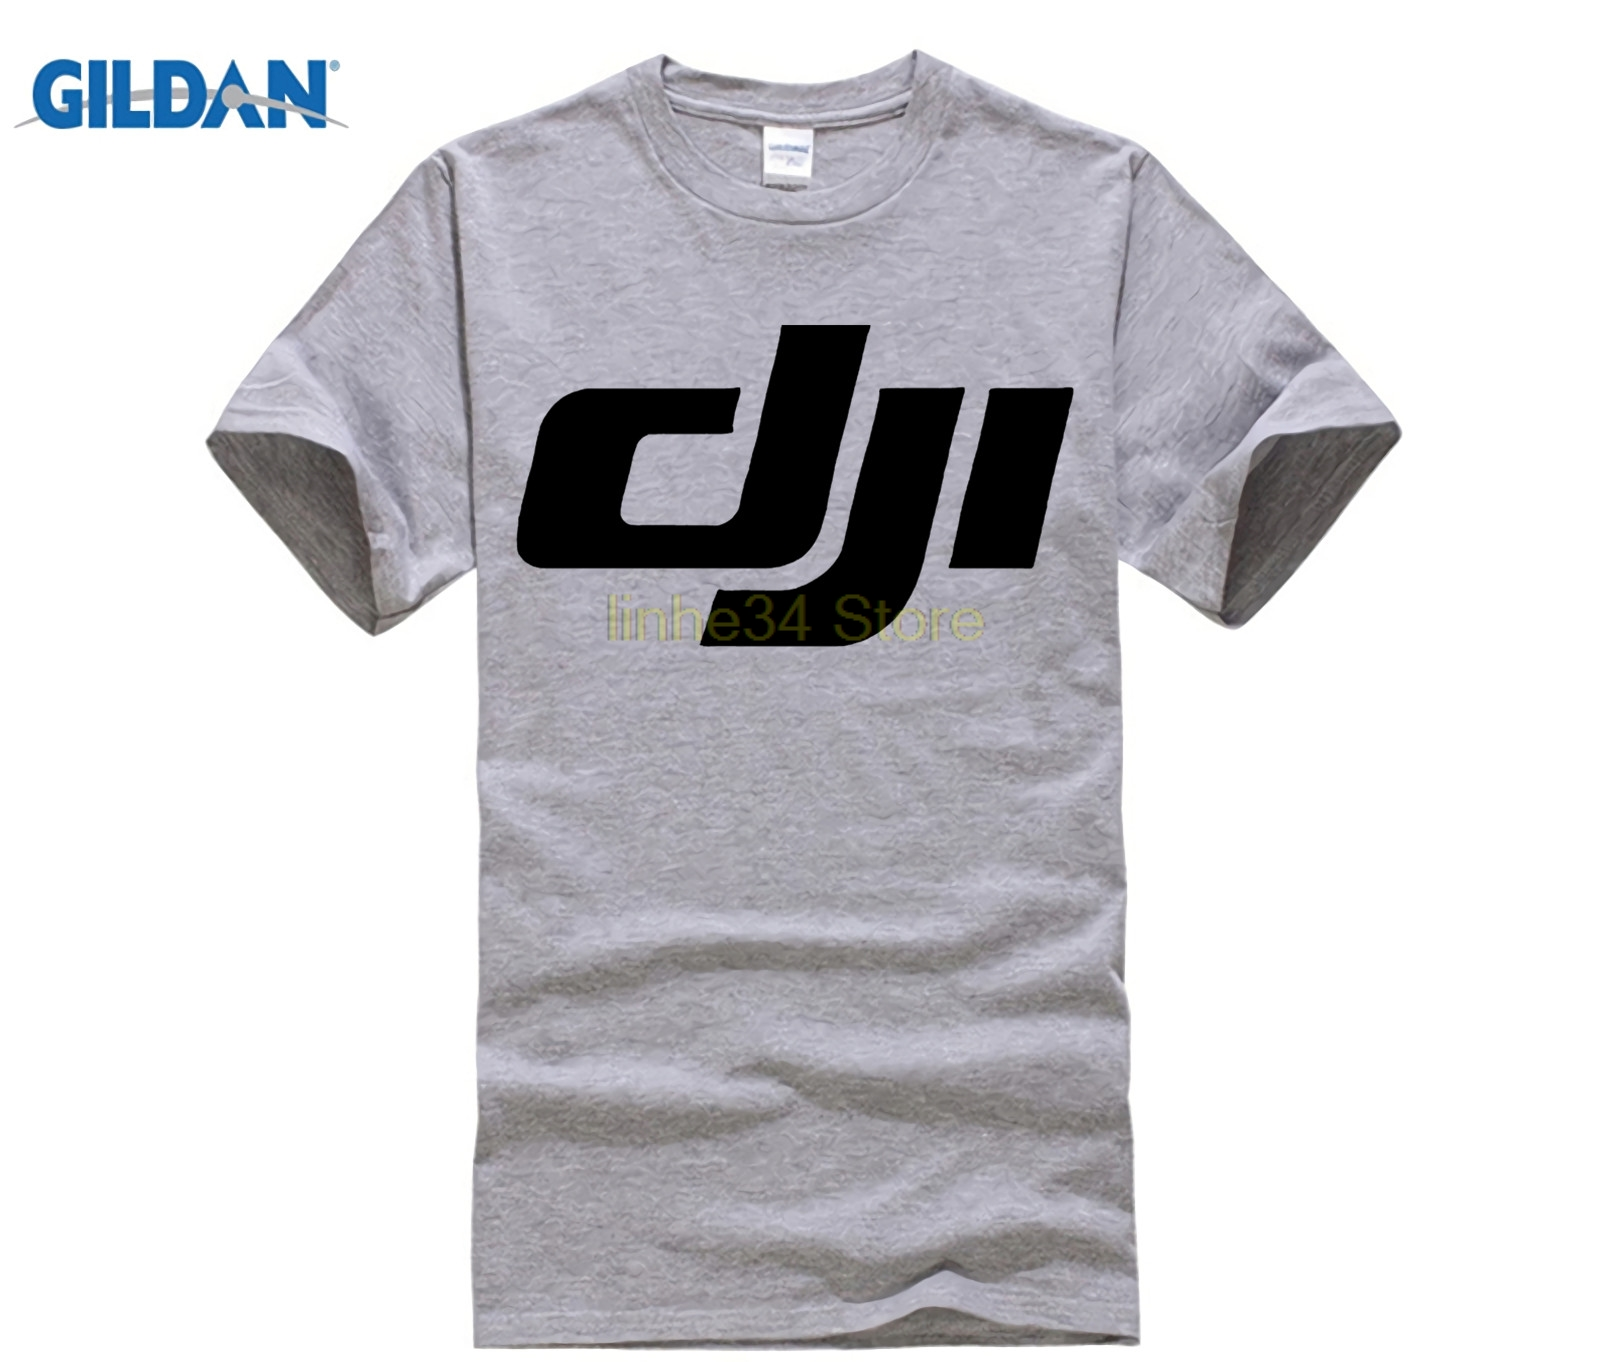 Fashion Dji Phantom T Shirt 2 Side Black White Funny Brand O Neck Cotton T Shirt Tees Print Shirts